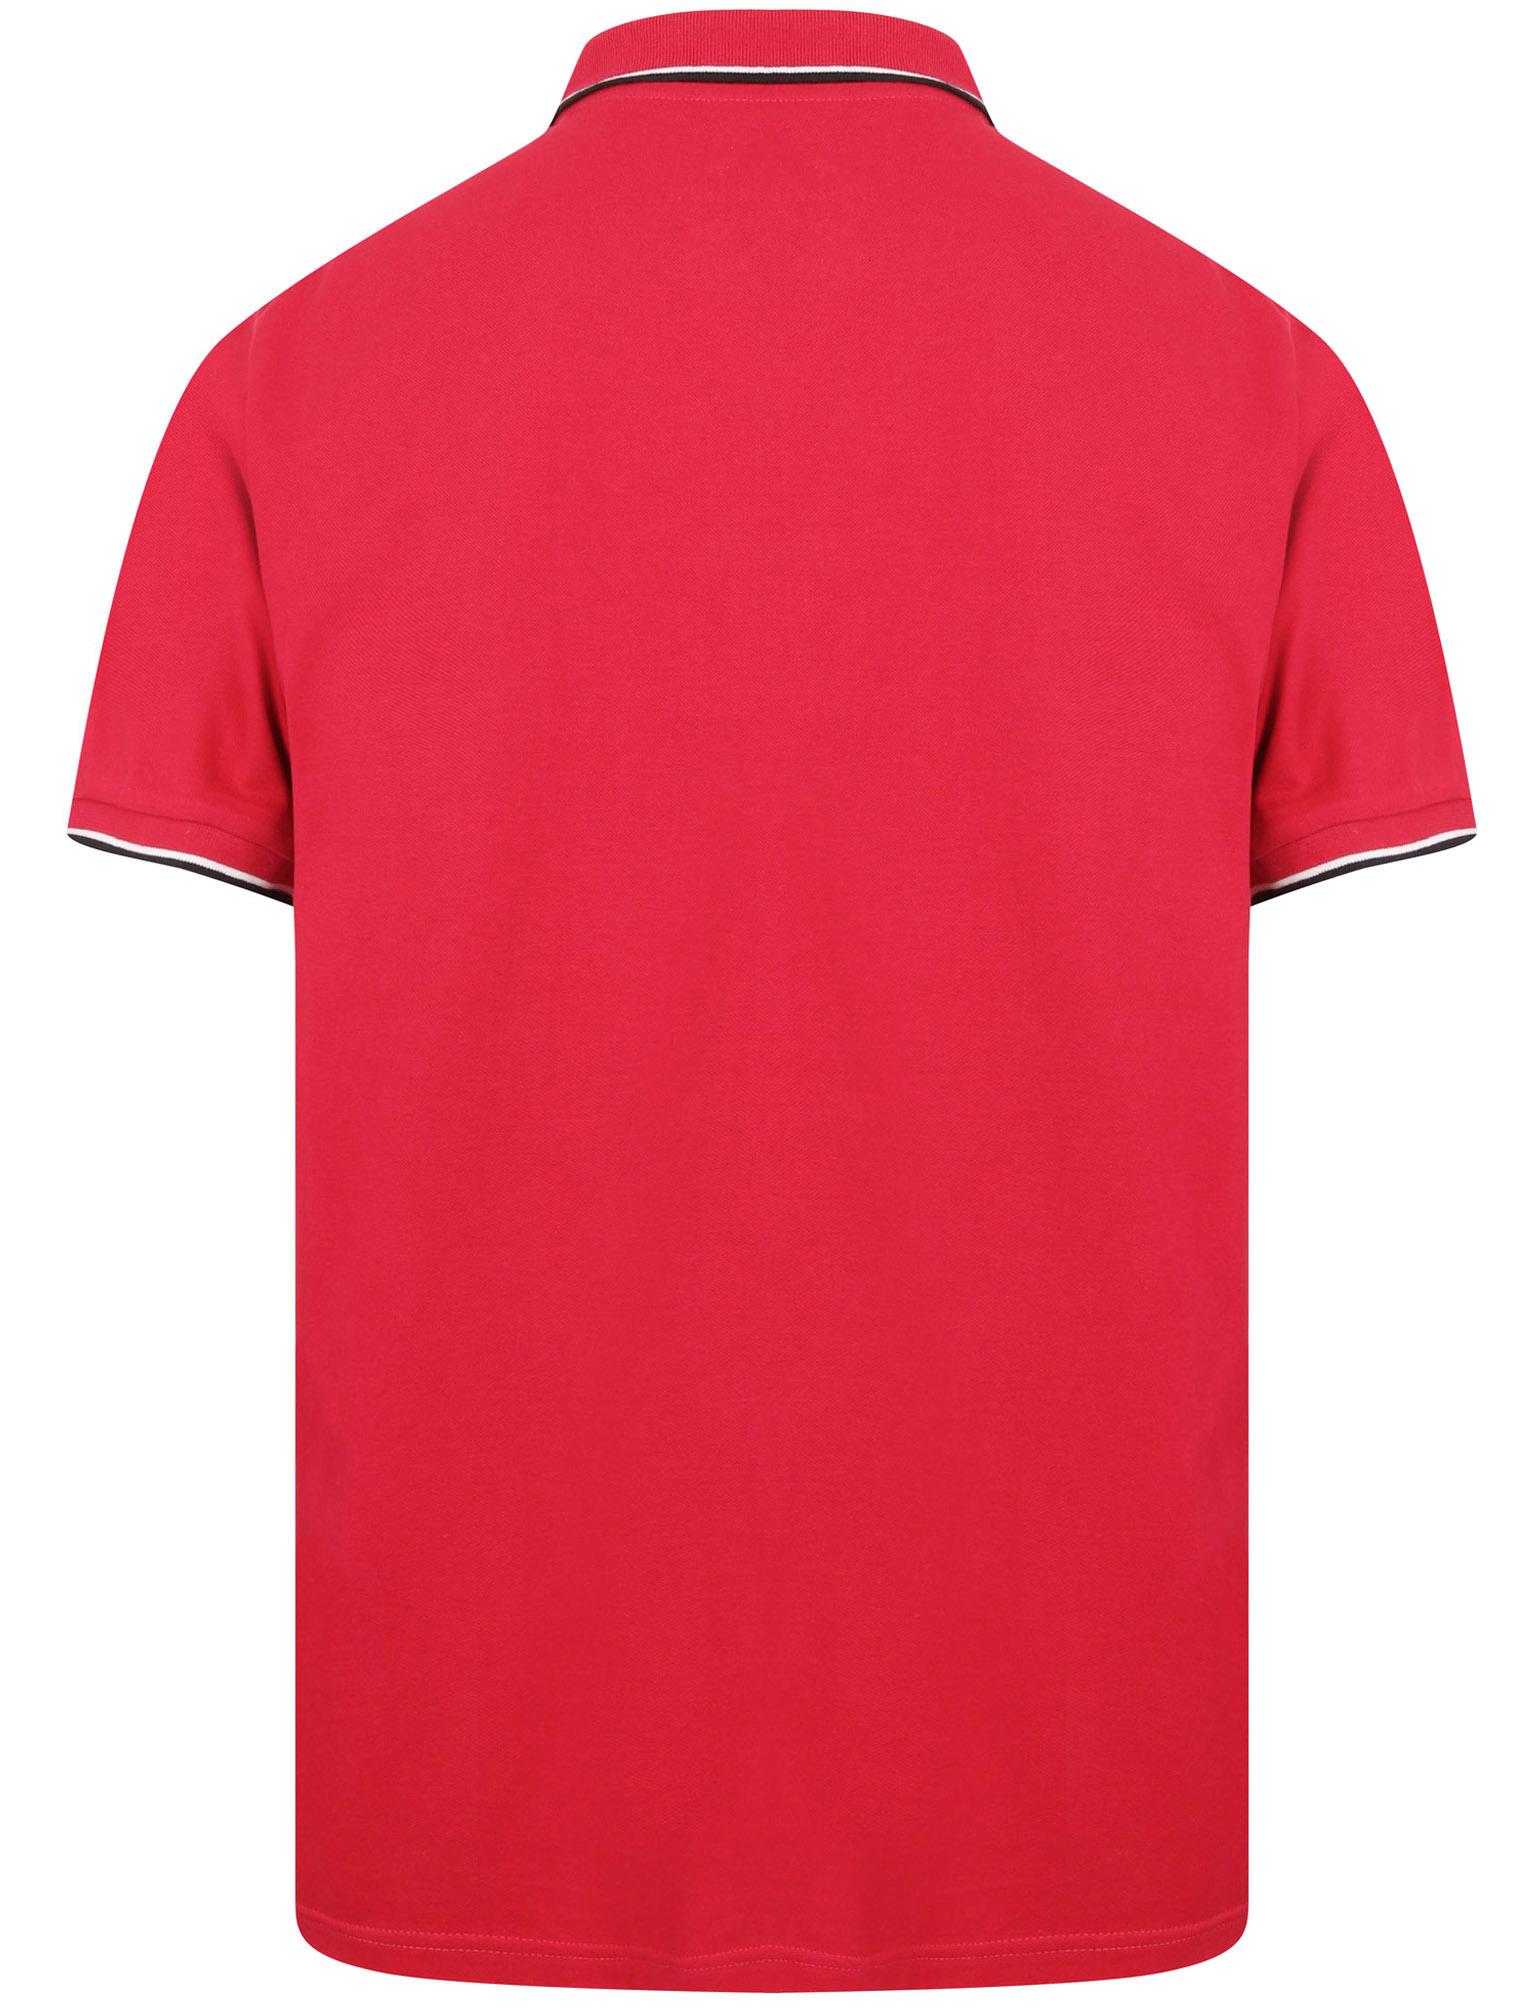 Sth-Shore-Mens-Plain-Polo-Shirt-100-Pique-Cotton-T-Shirt-Top-Collar-Size-M-XXL thumbnail 35